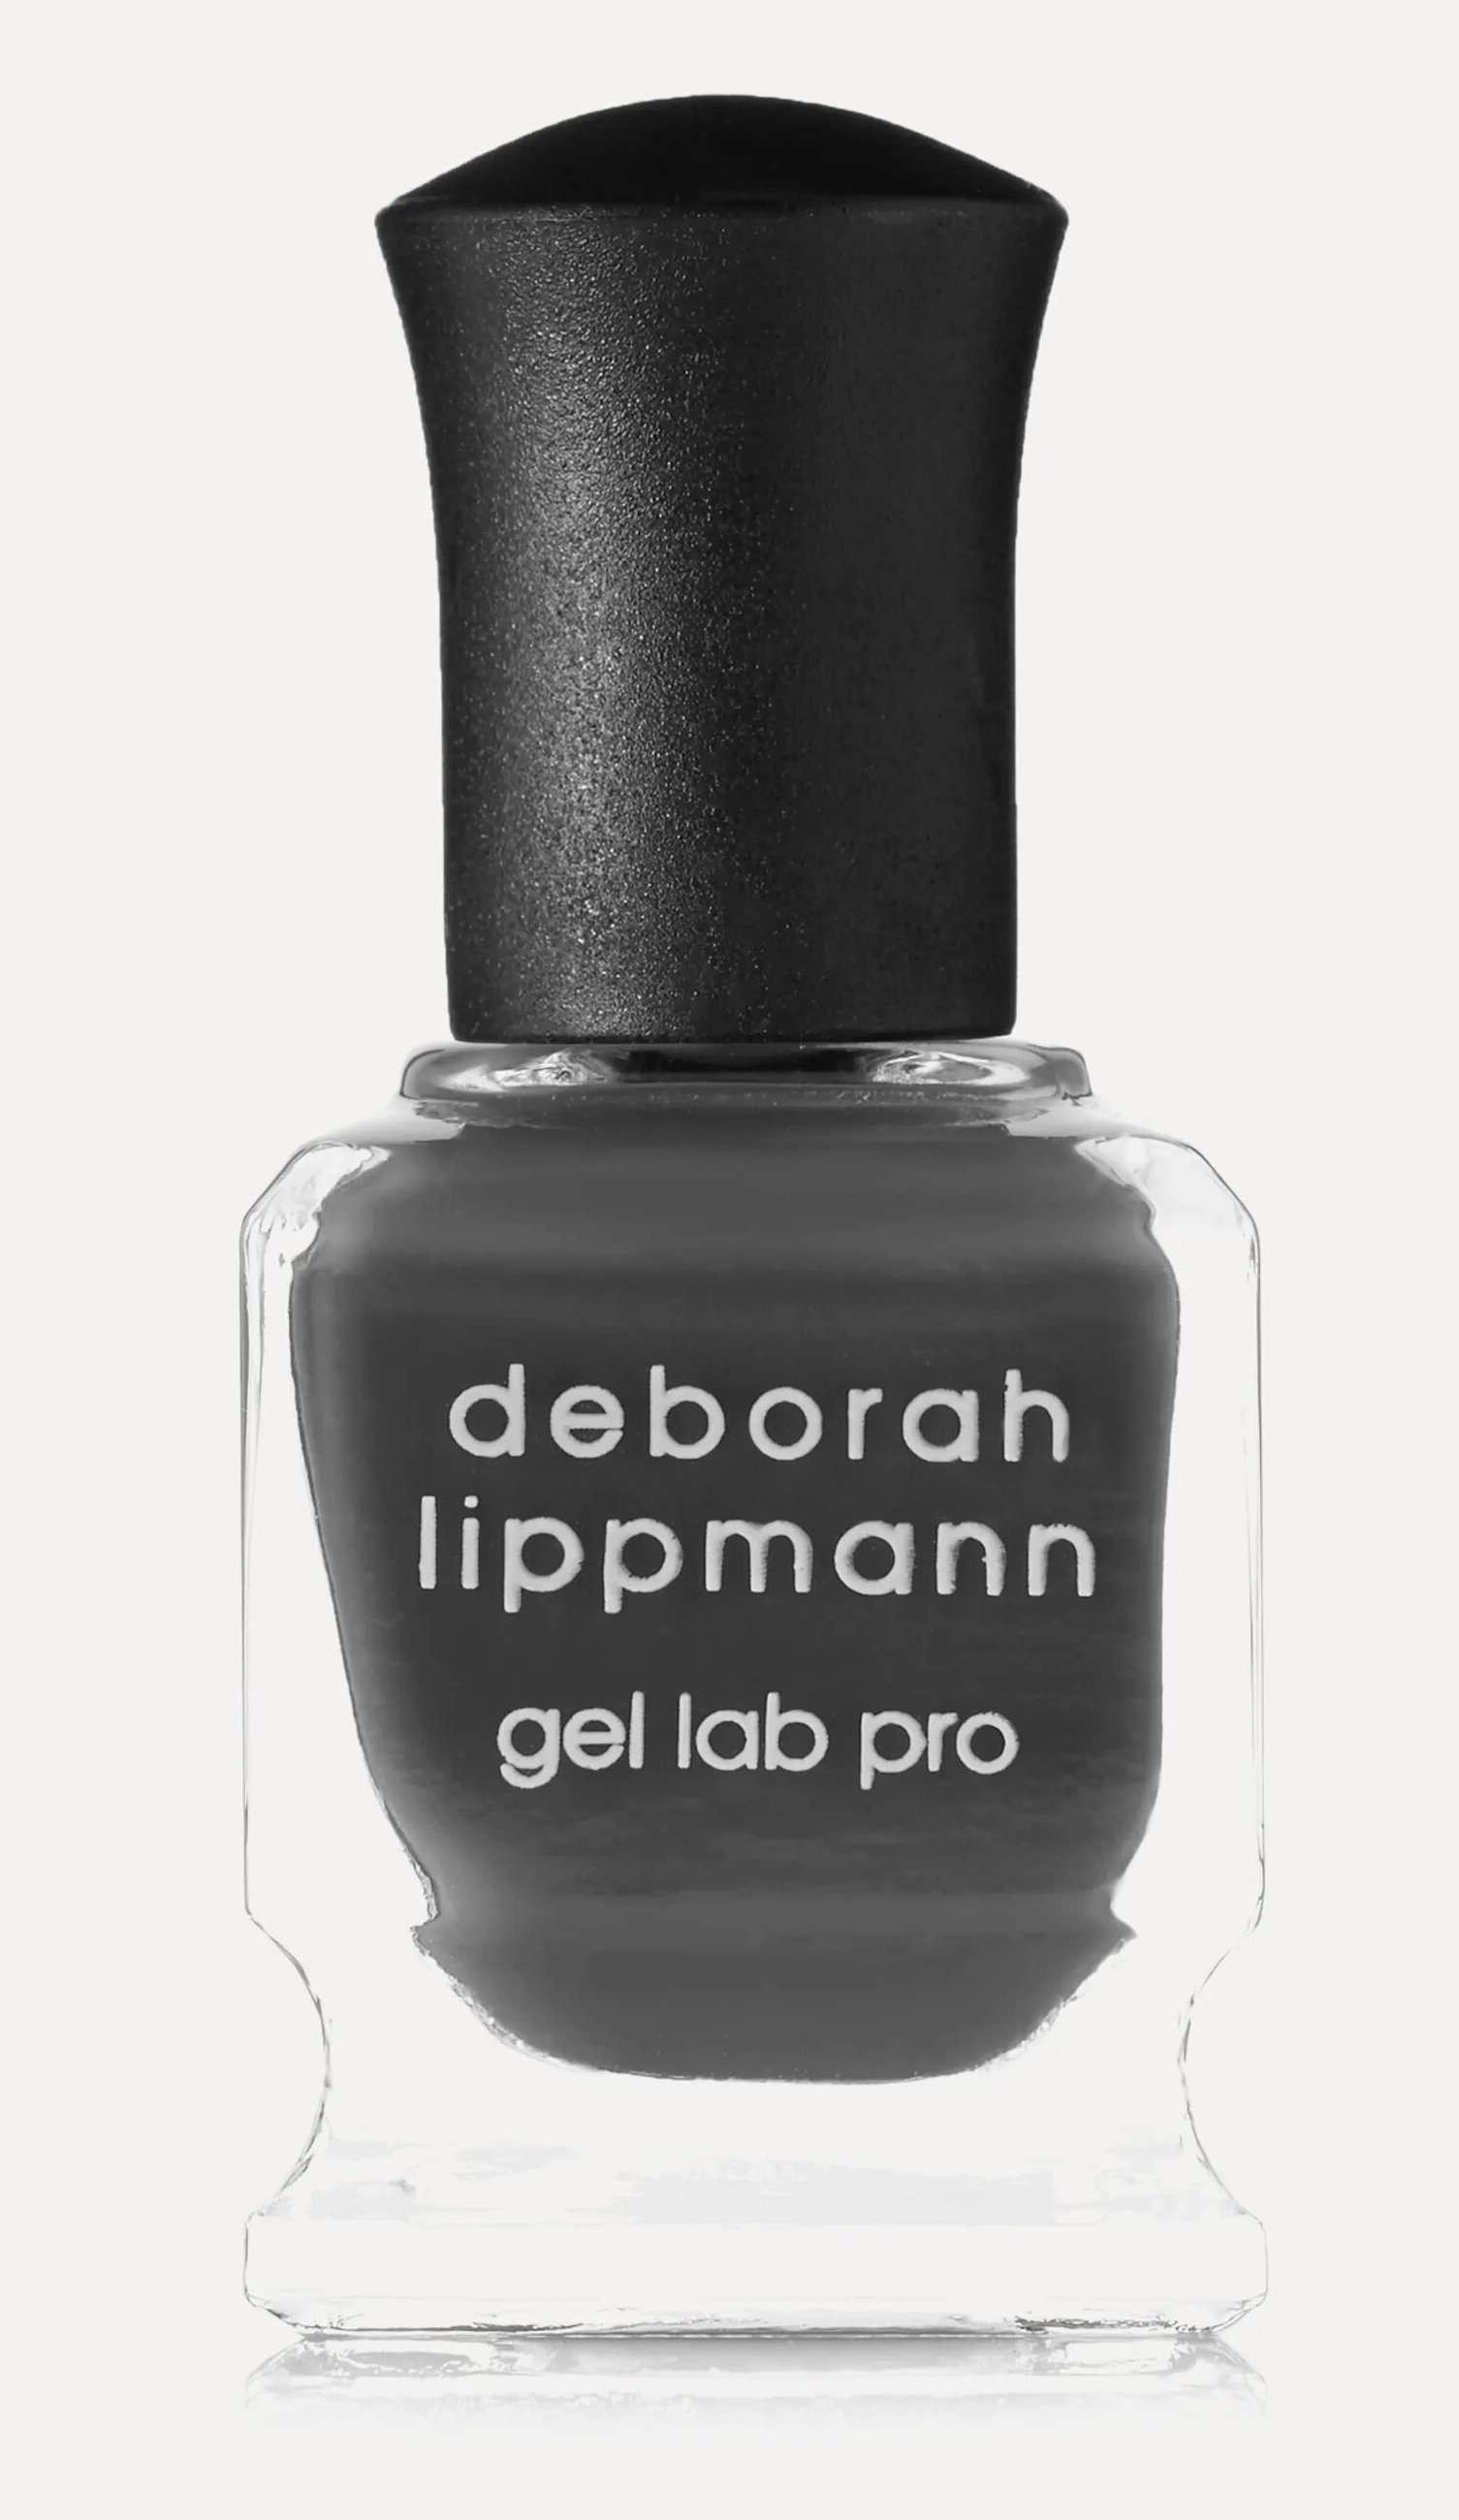 Deborah Lippman Gel Lab Pro in Stormy Weather